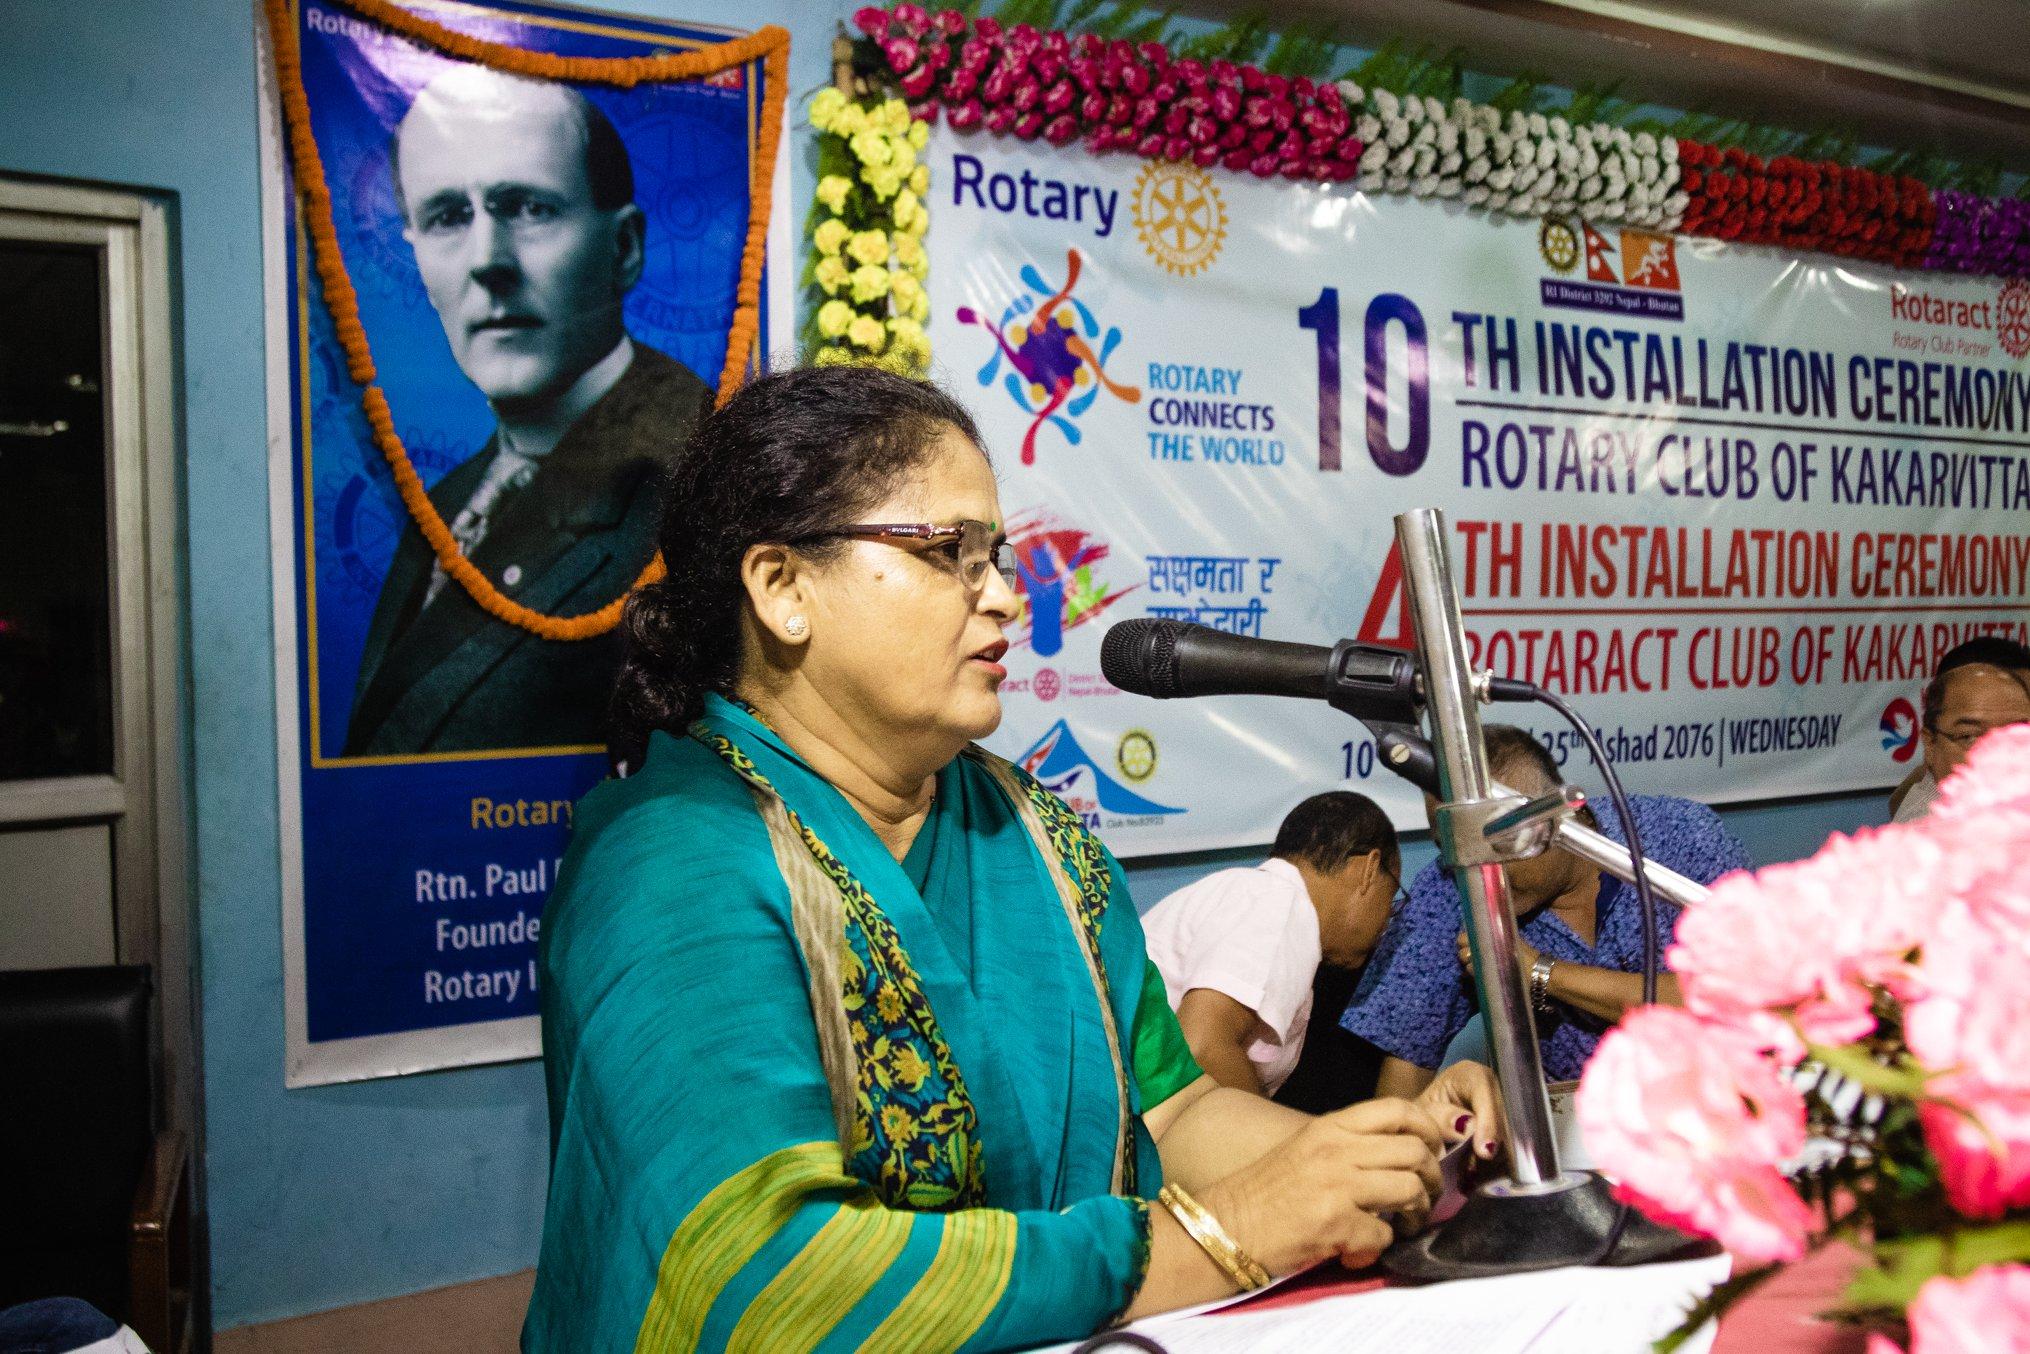 10th Installation Ceremony Rotary Club Of Kakarvitta 45